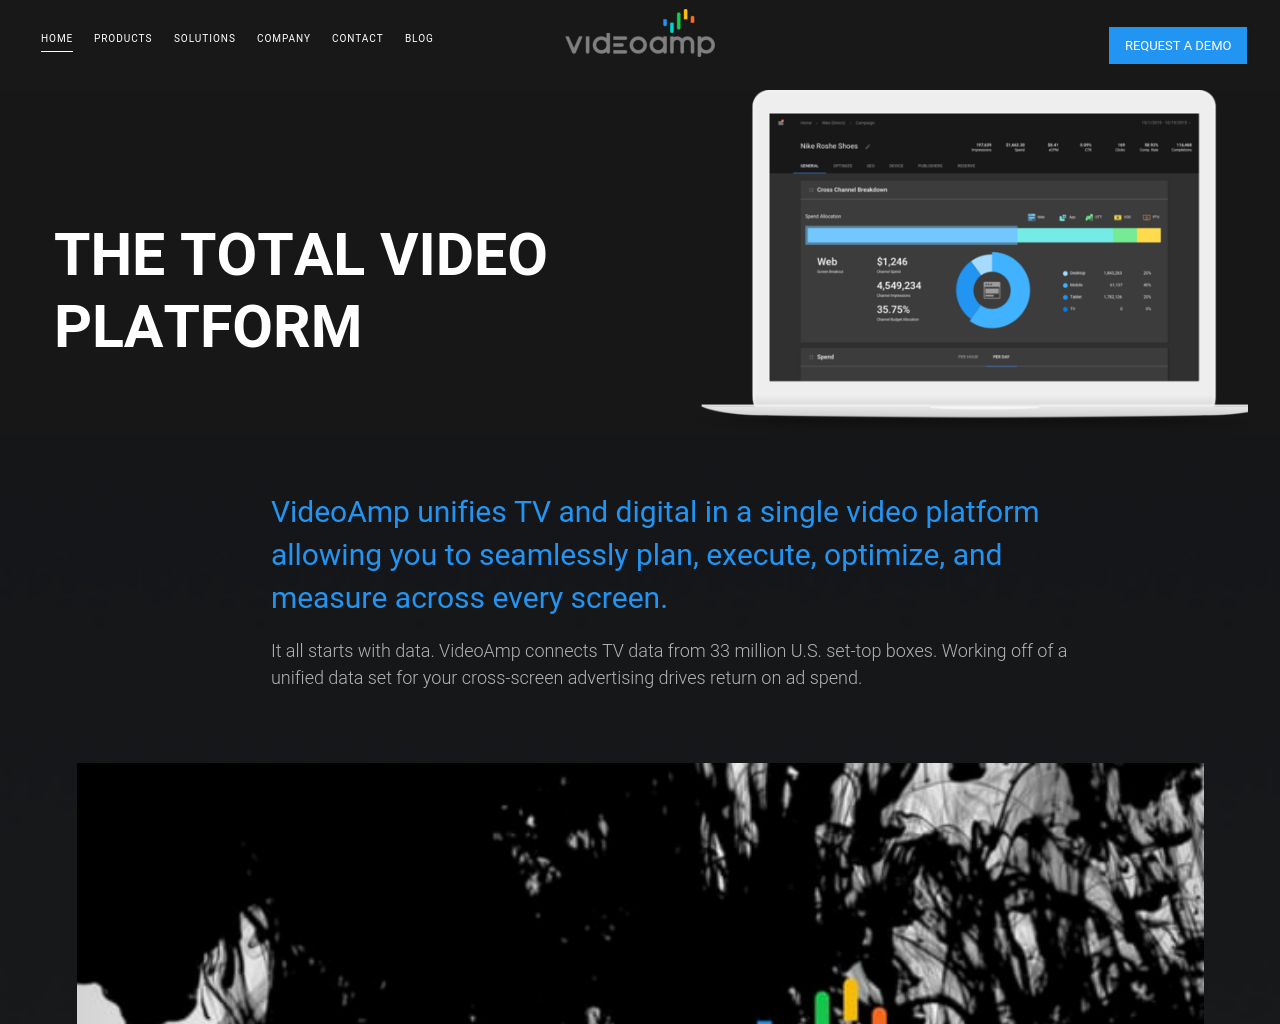 Videoamp-Advertising-Reviews-Pricing